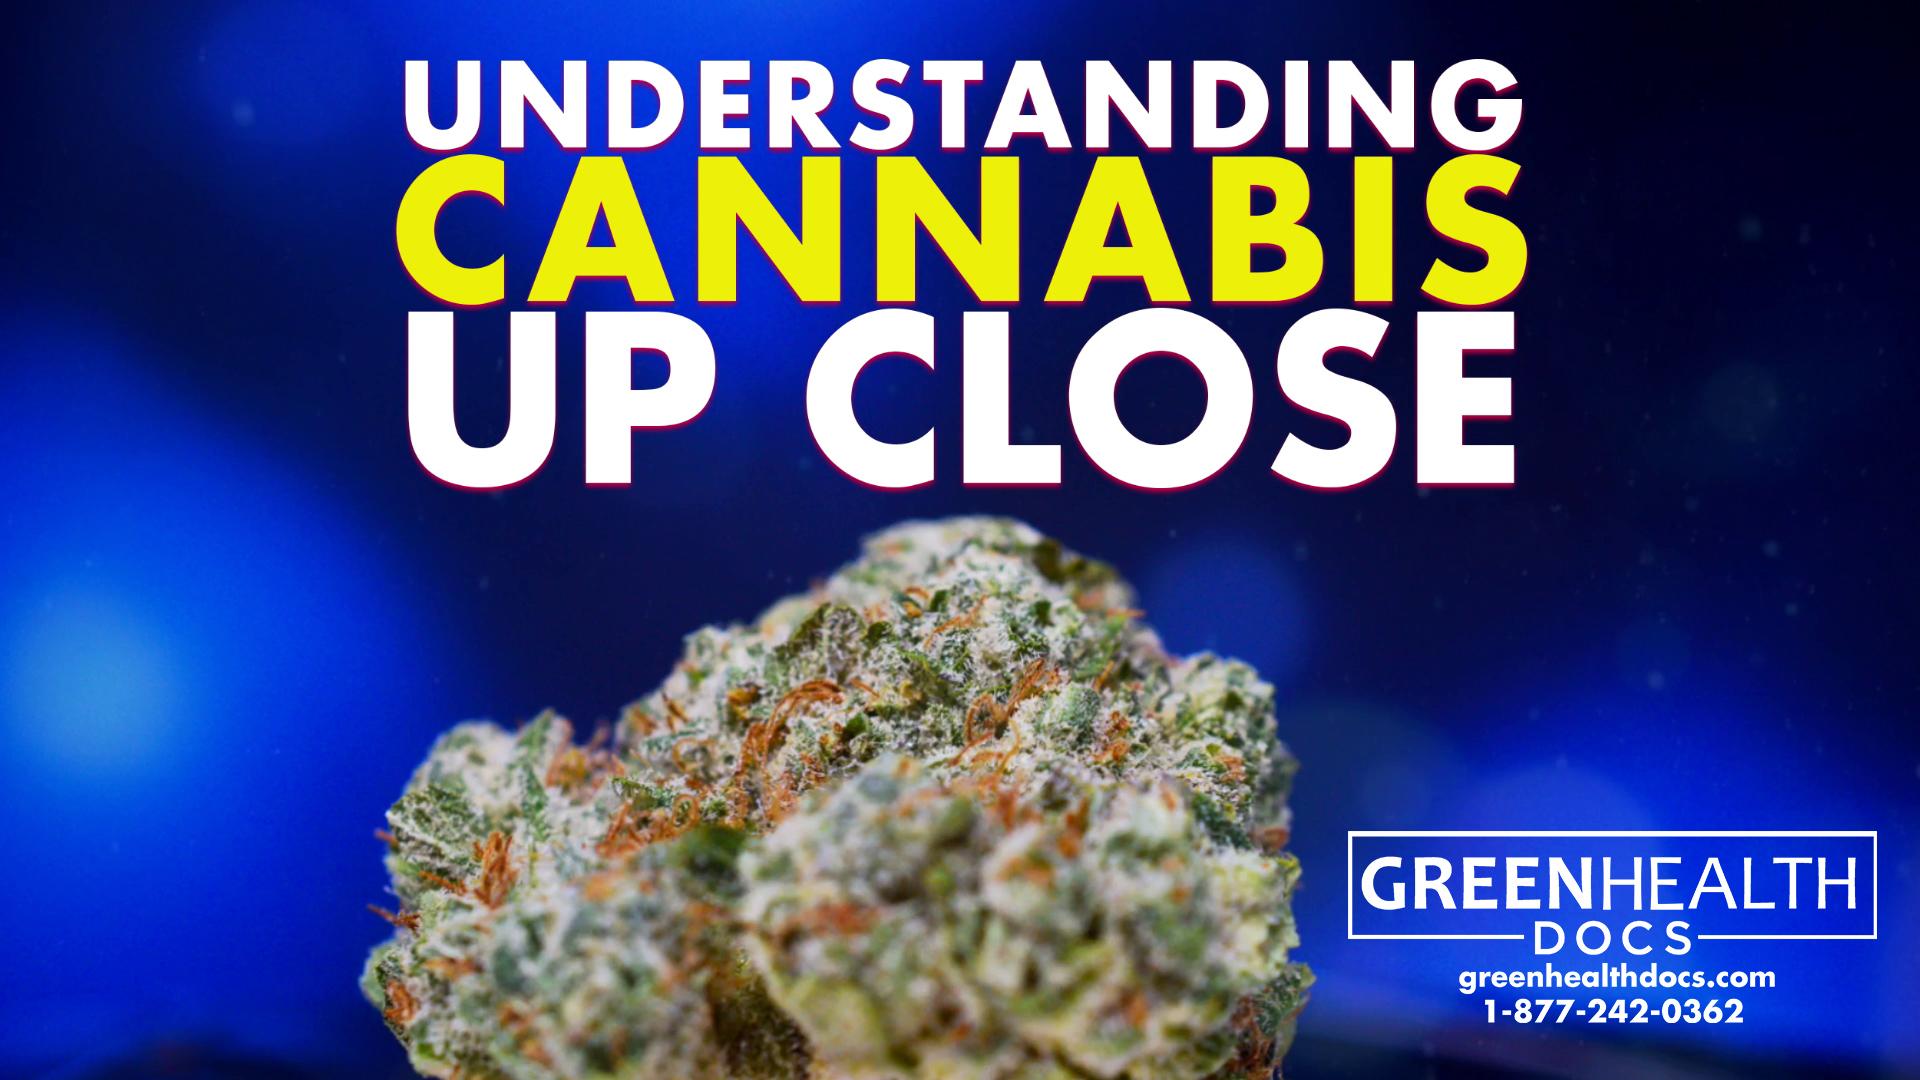 understanding cannabis up close